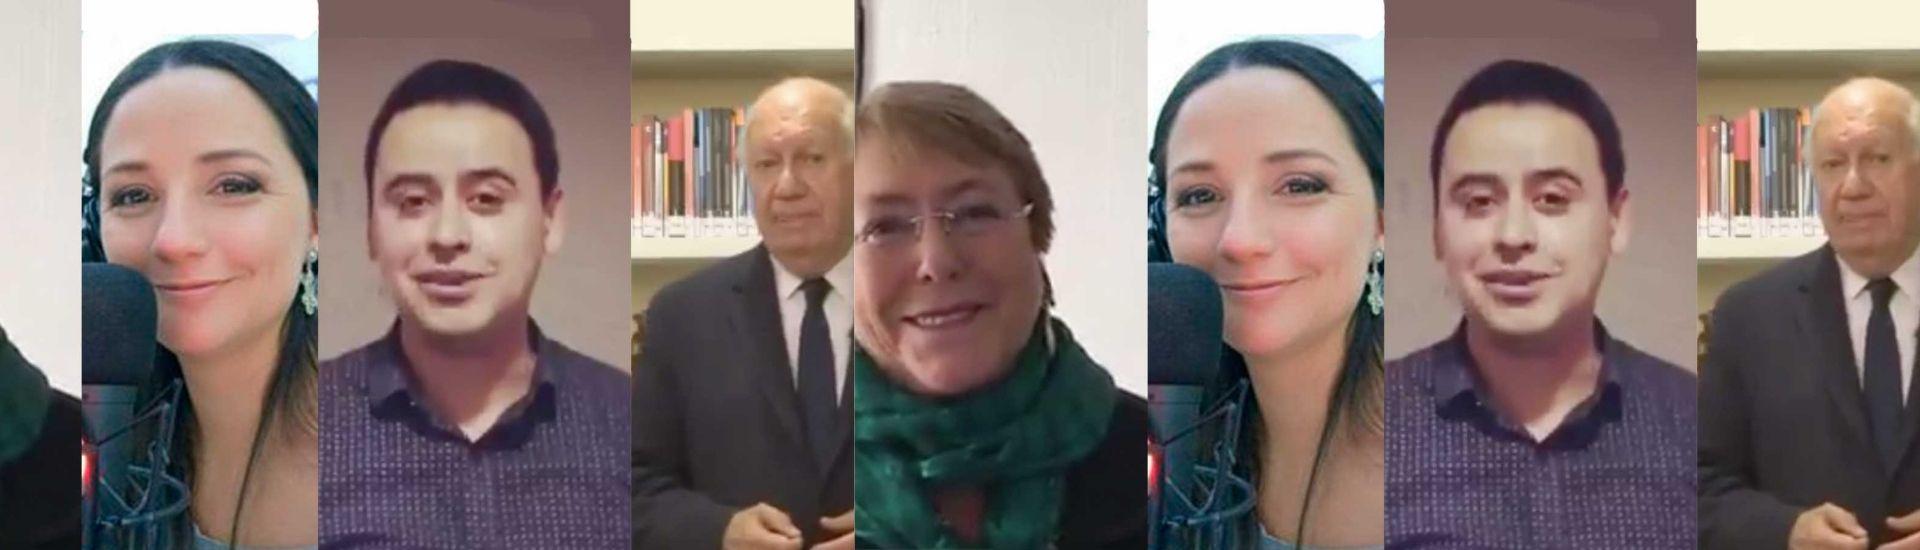 Michelle Bachelet, Andrea Aristegui,Alberto Lopez, Ricardo Lagos